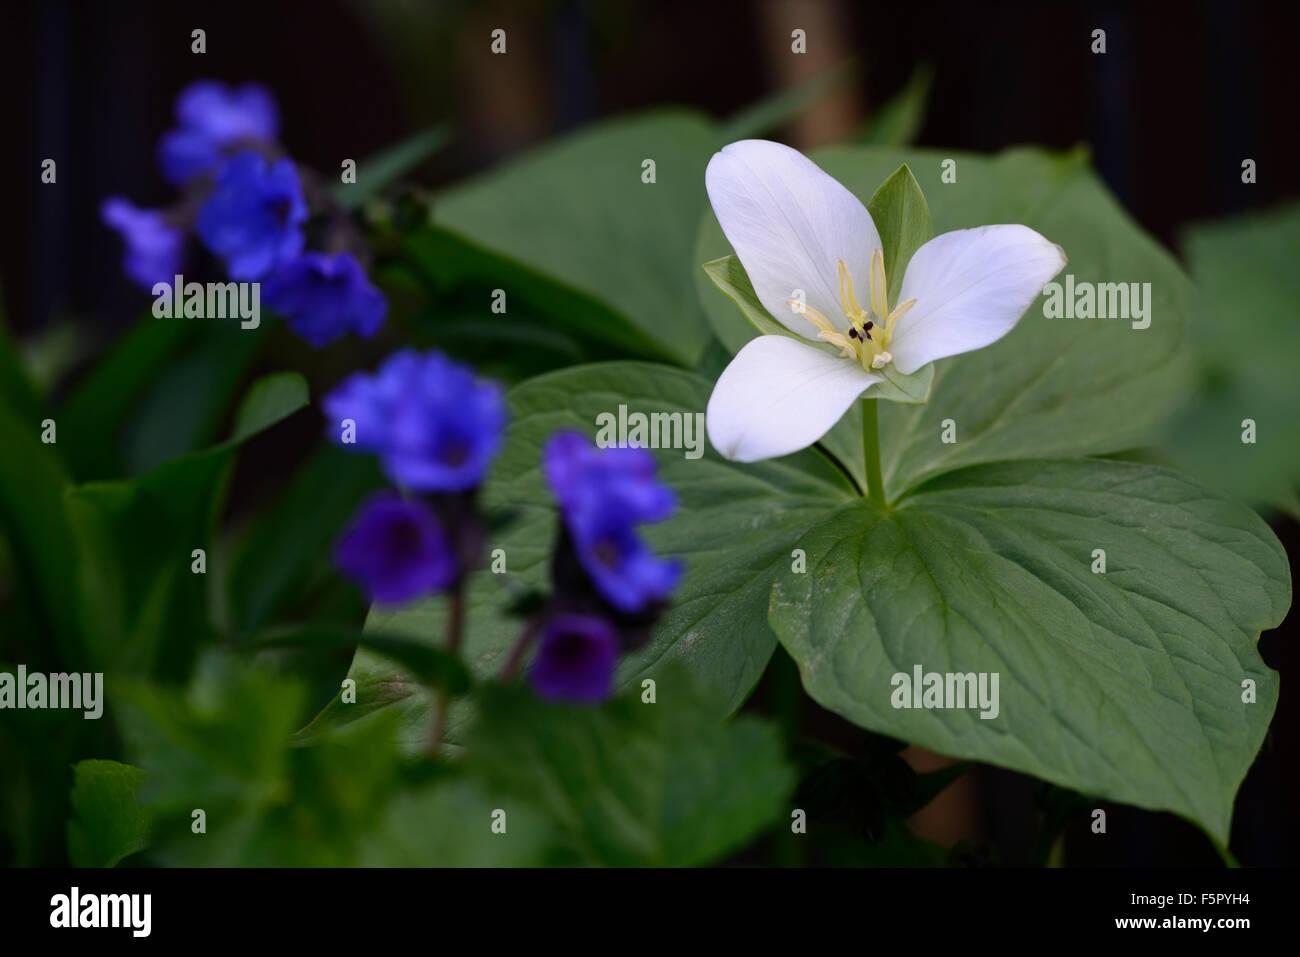 Trillium Camtschatcense Pulmonaria Blue Ensign Spring Flowers Stock